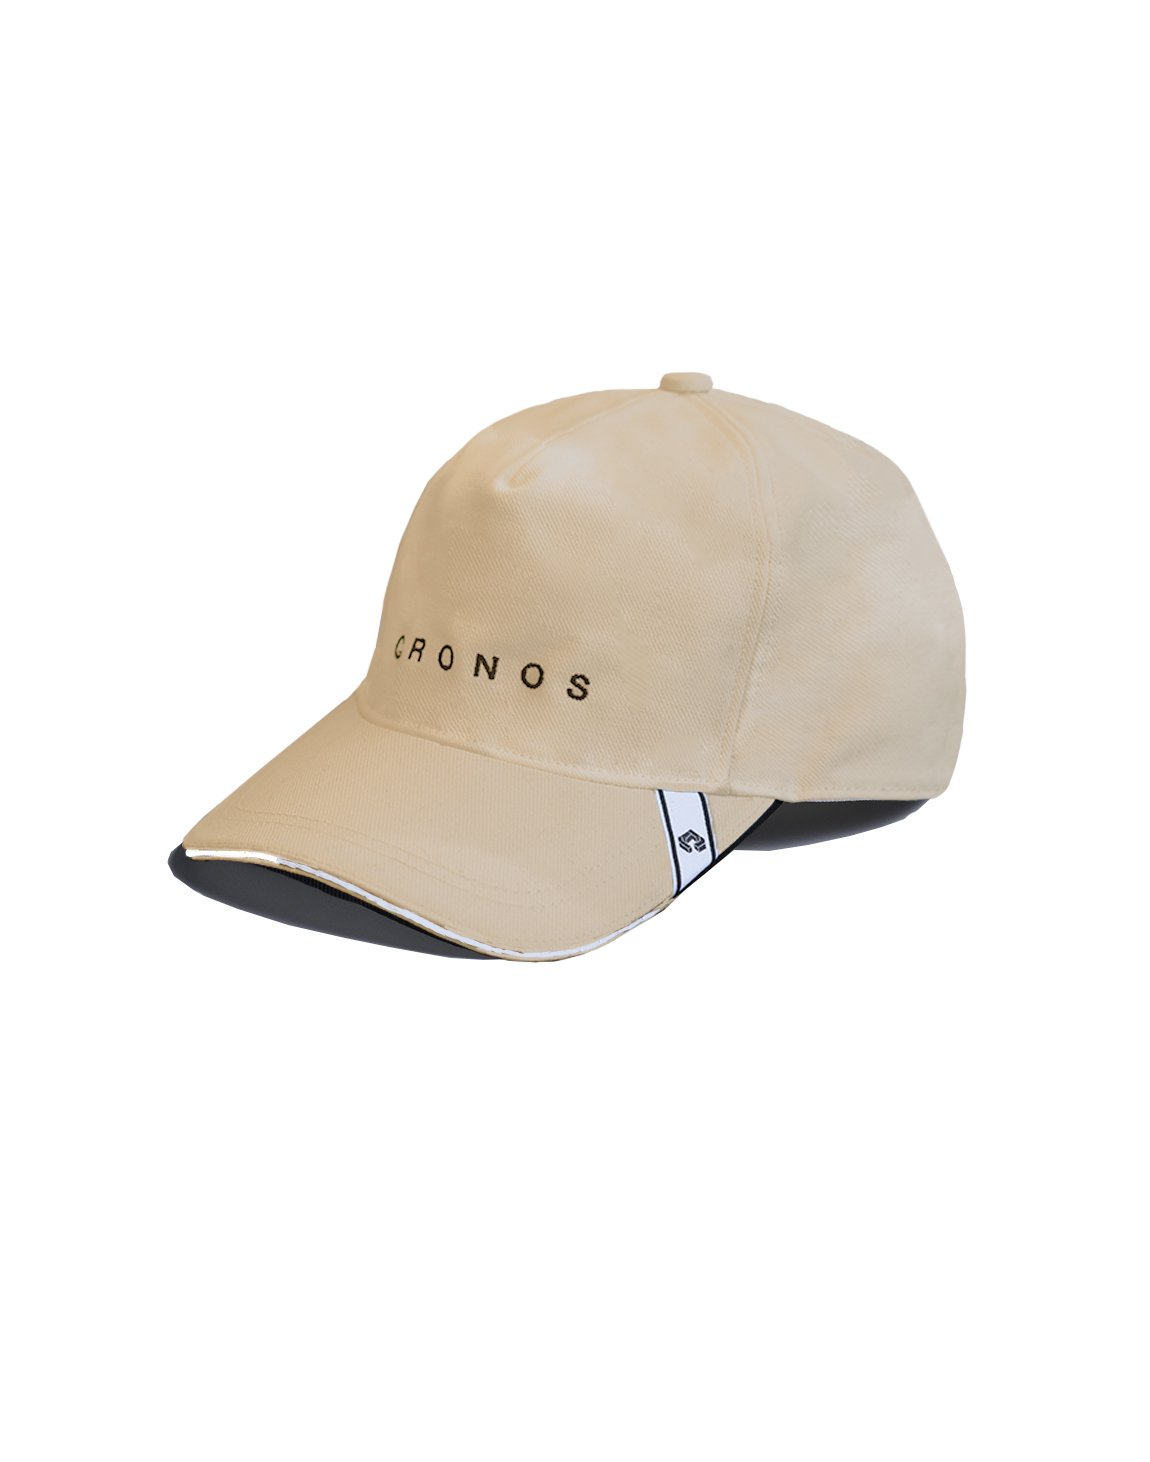 CRONOS FONT LOGO CAP【BEIGE】